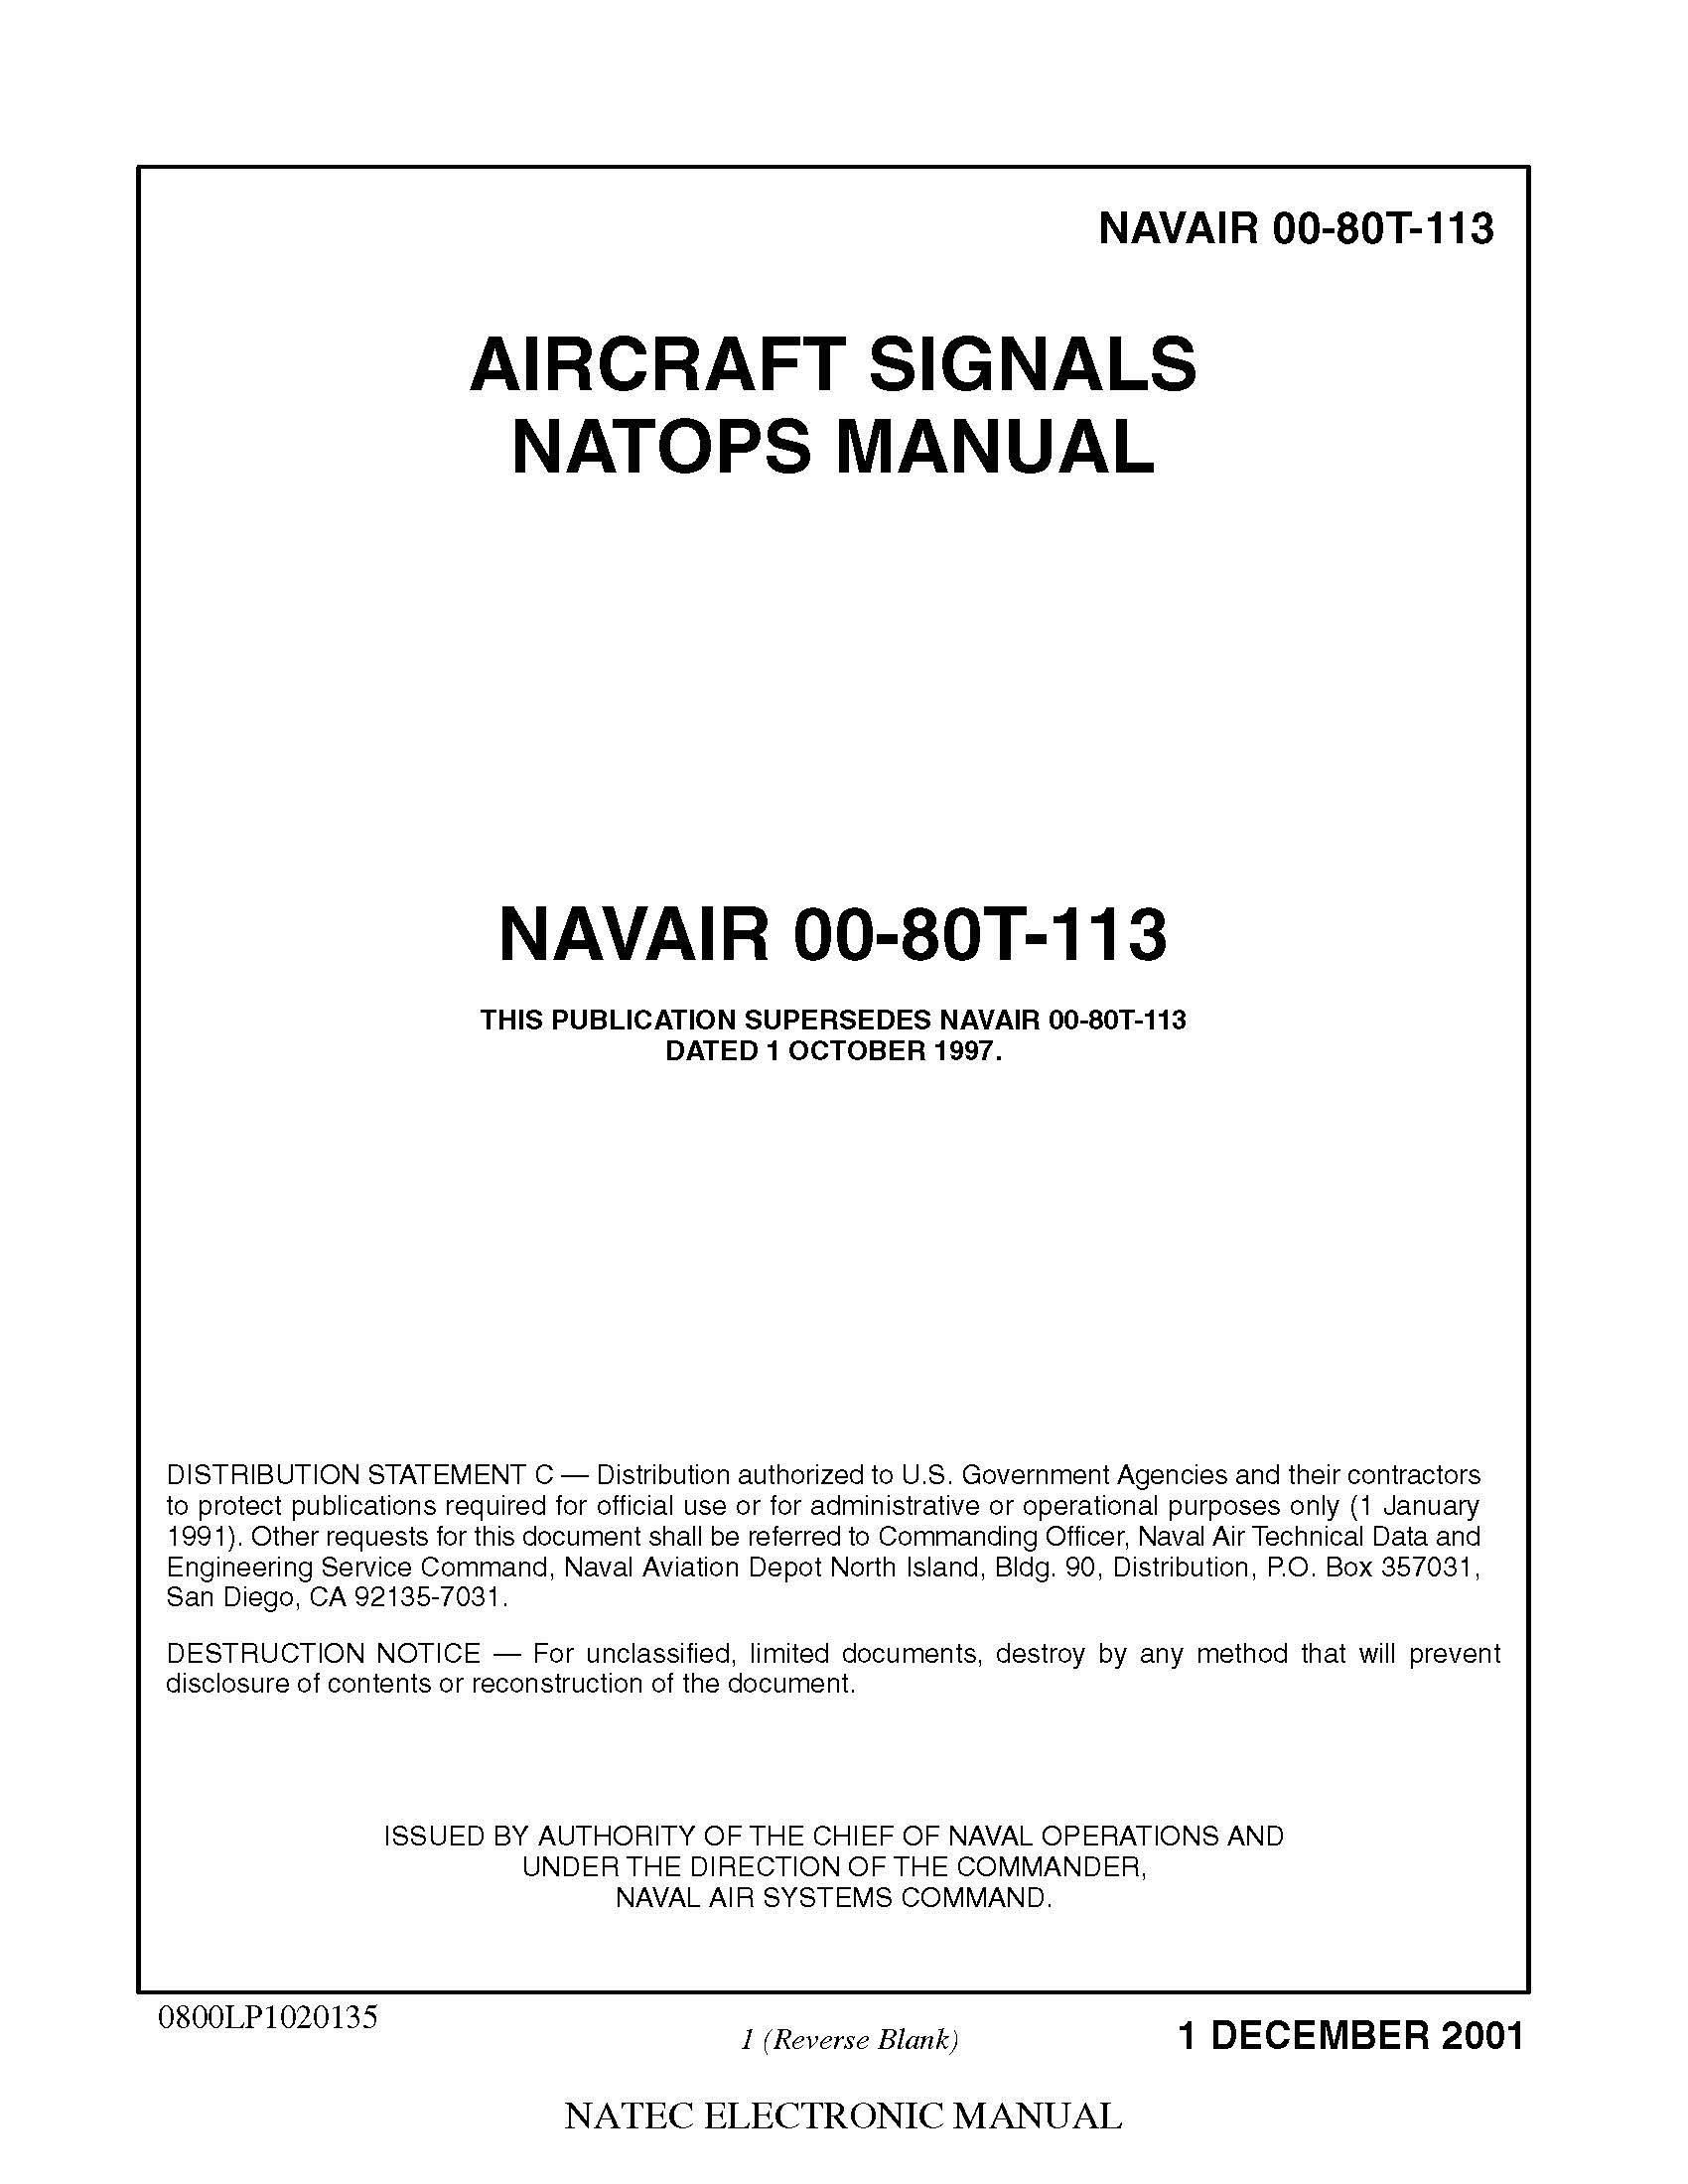 NAVAIR 00-80T-113 Aircraft Signals NATOPS Manual [Loose Leaf Edition] Loose  Leaf – 2001